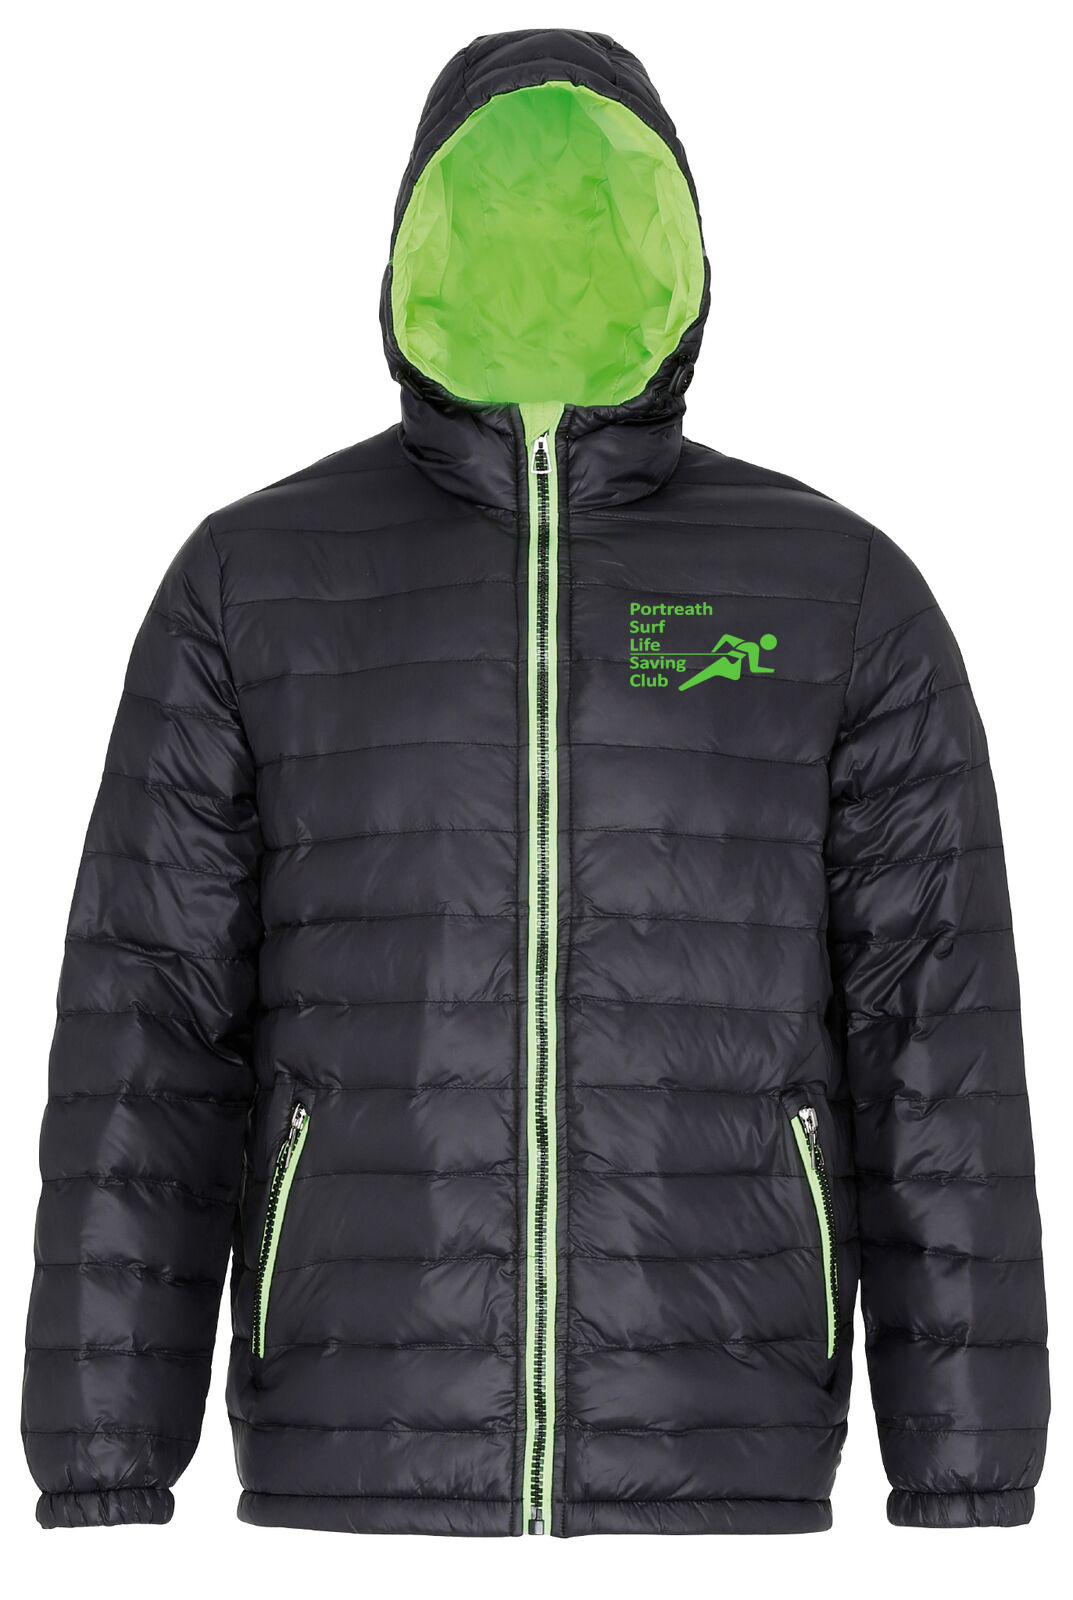 Portreath SLSC Snowbird Jacket